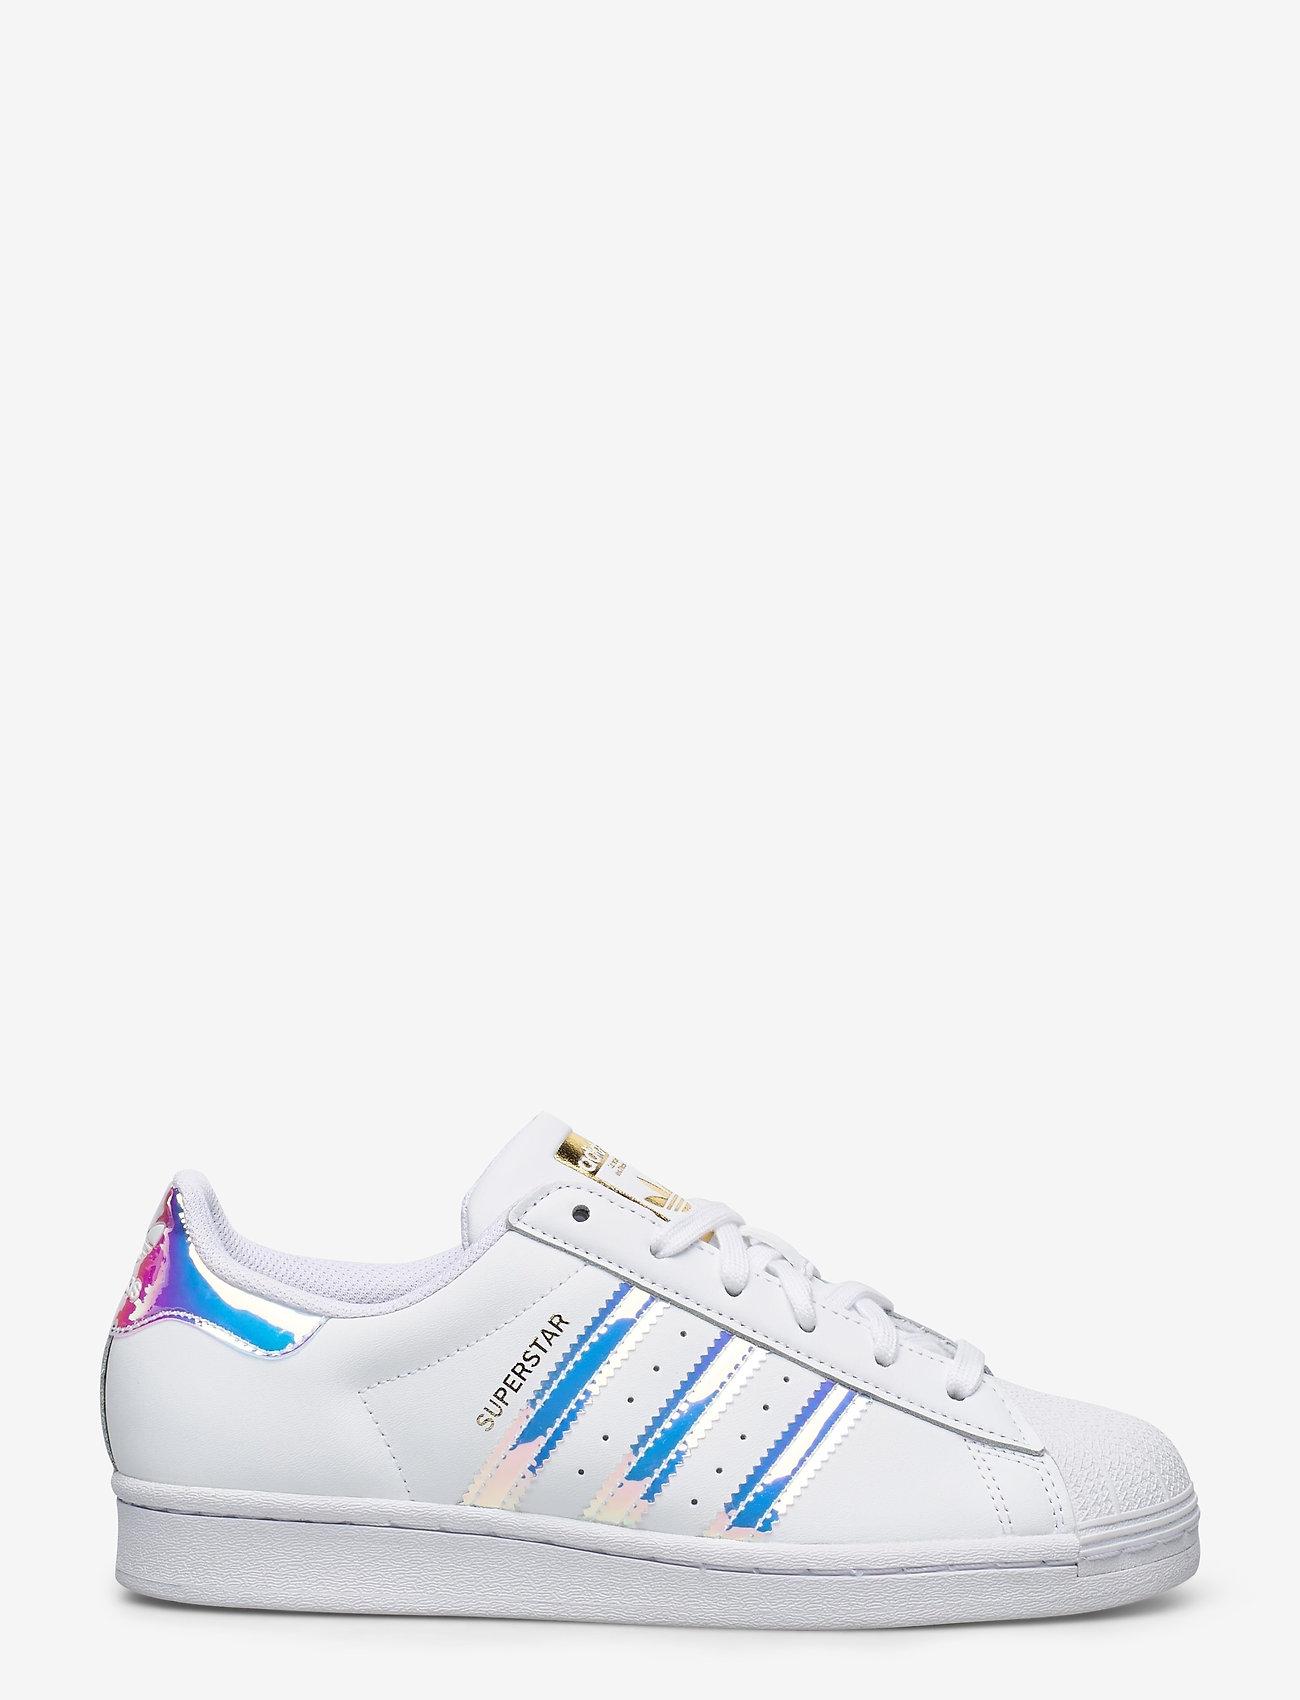 adidas Originals - SUPERSTAR W - sneakers - ftwwht/goldmt/cblack - 1